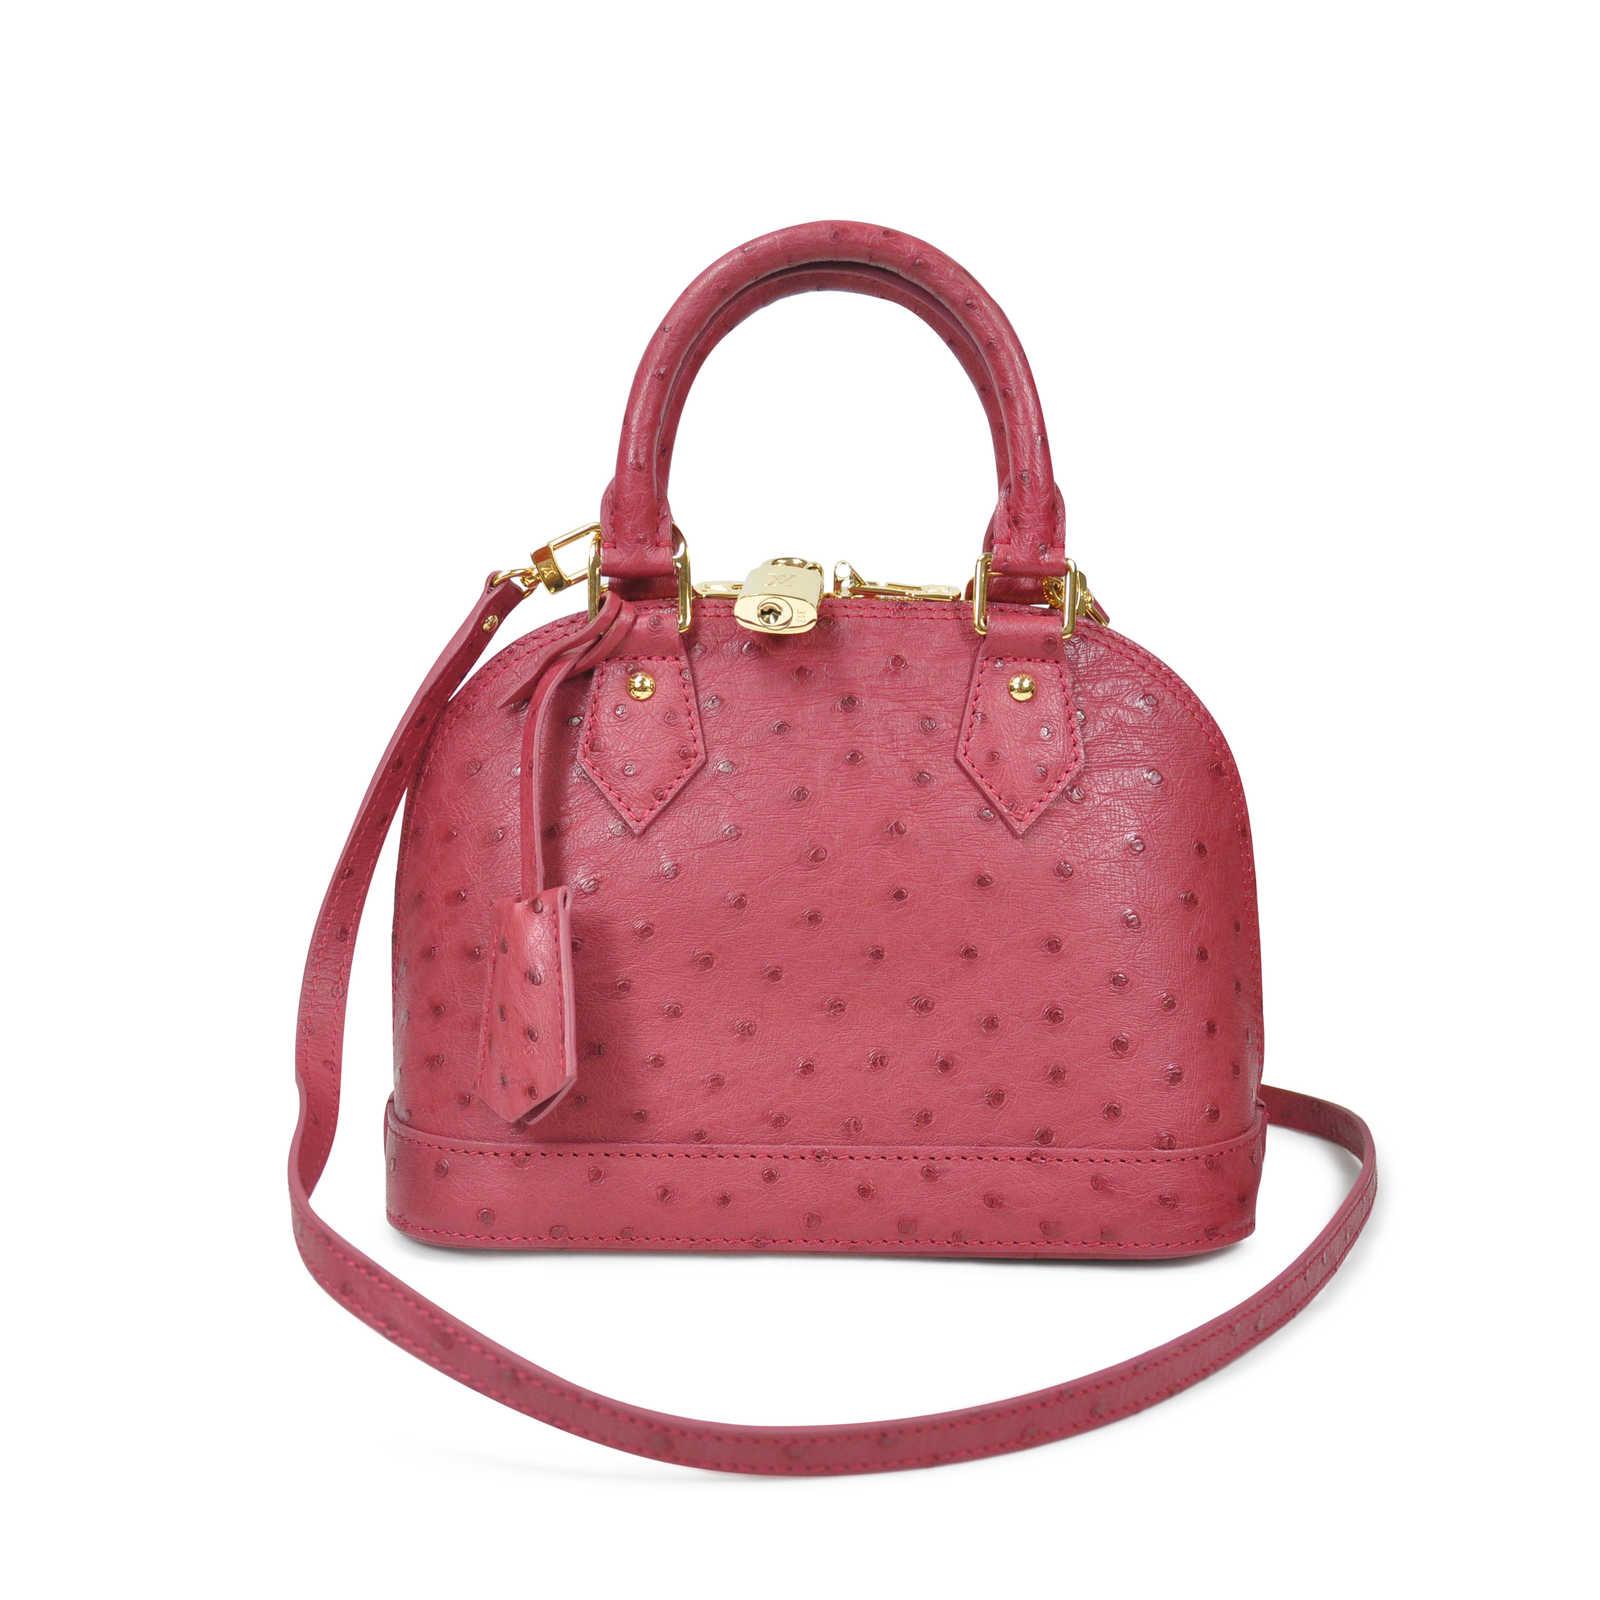 Authentic Pre Owned Louis Vuitton Ostrich Alma Bb Bag Pss 020 00019 Gucci Mini